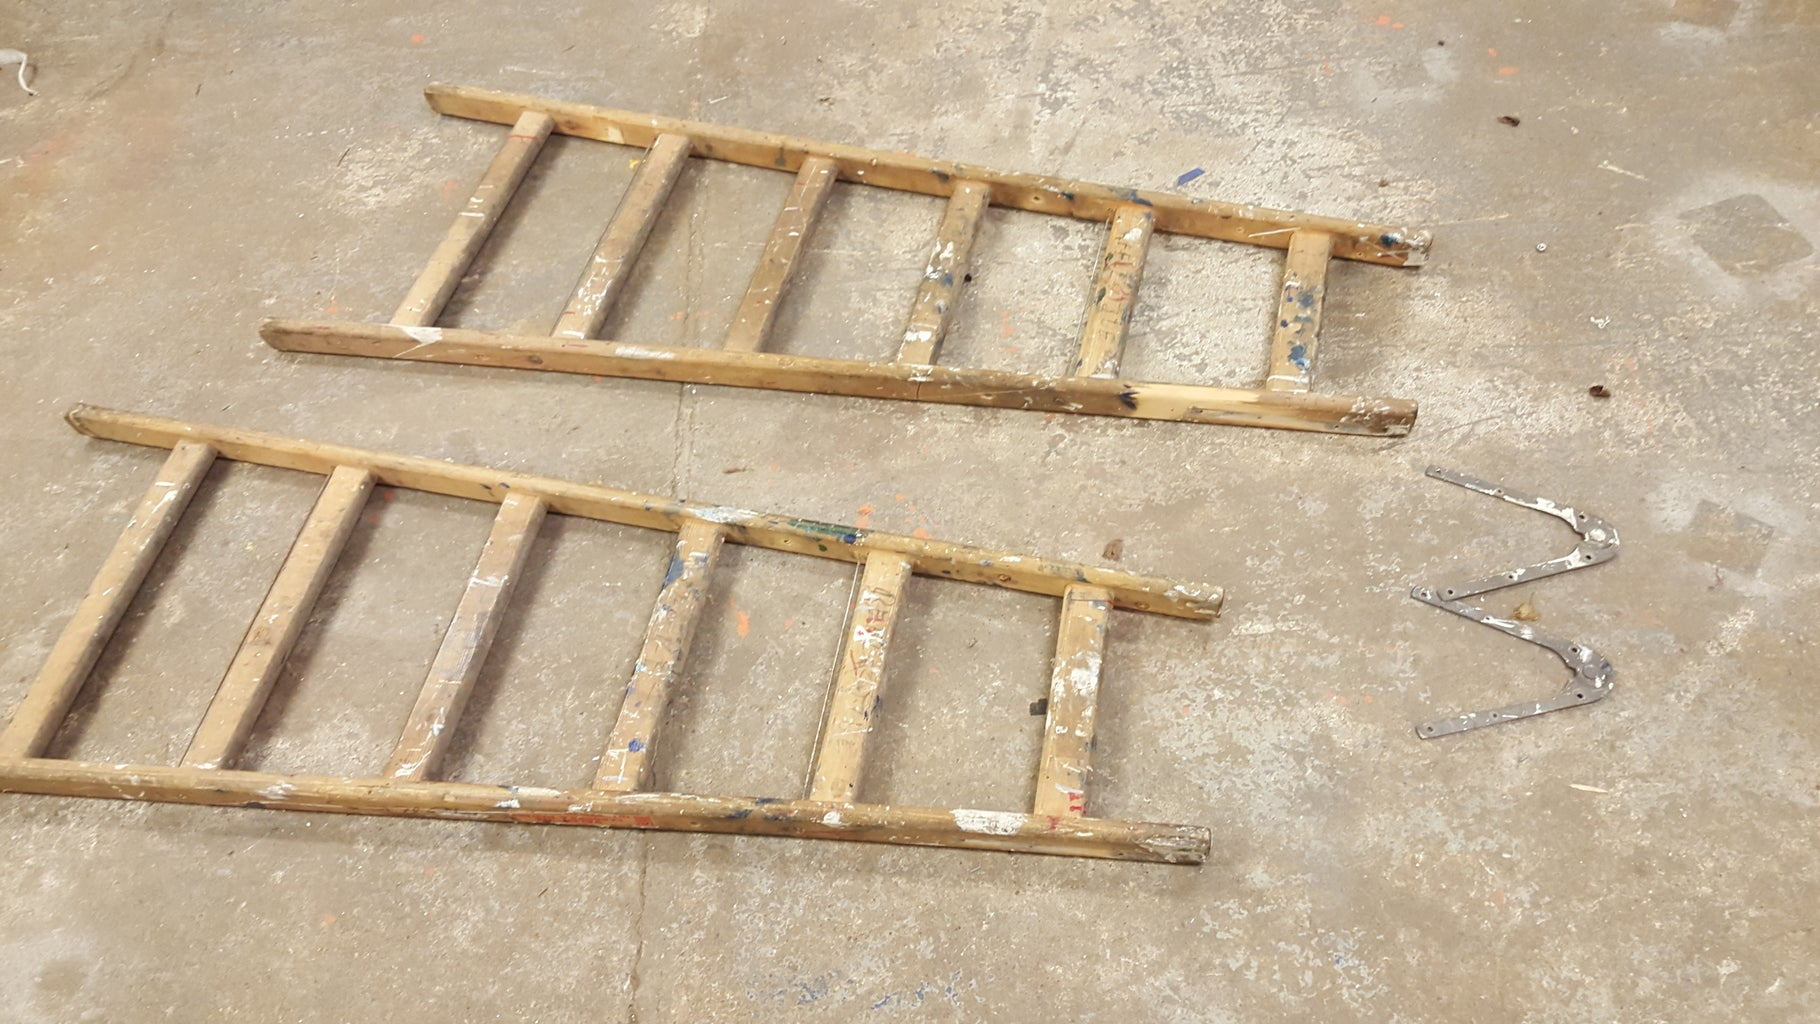 Strip the Old Ladder